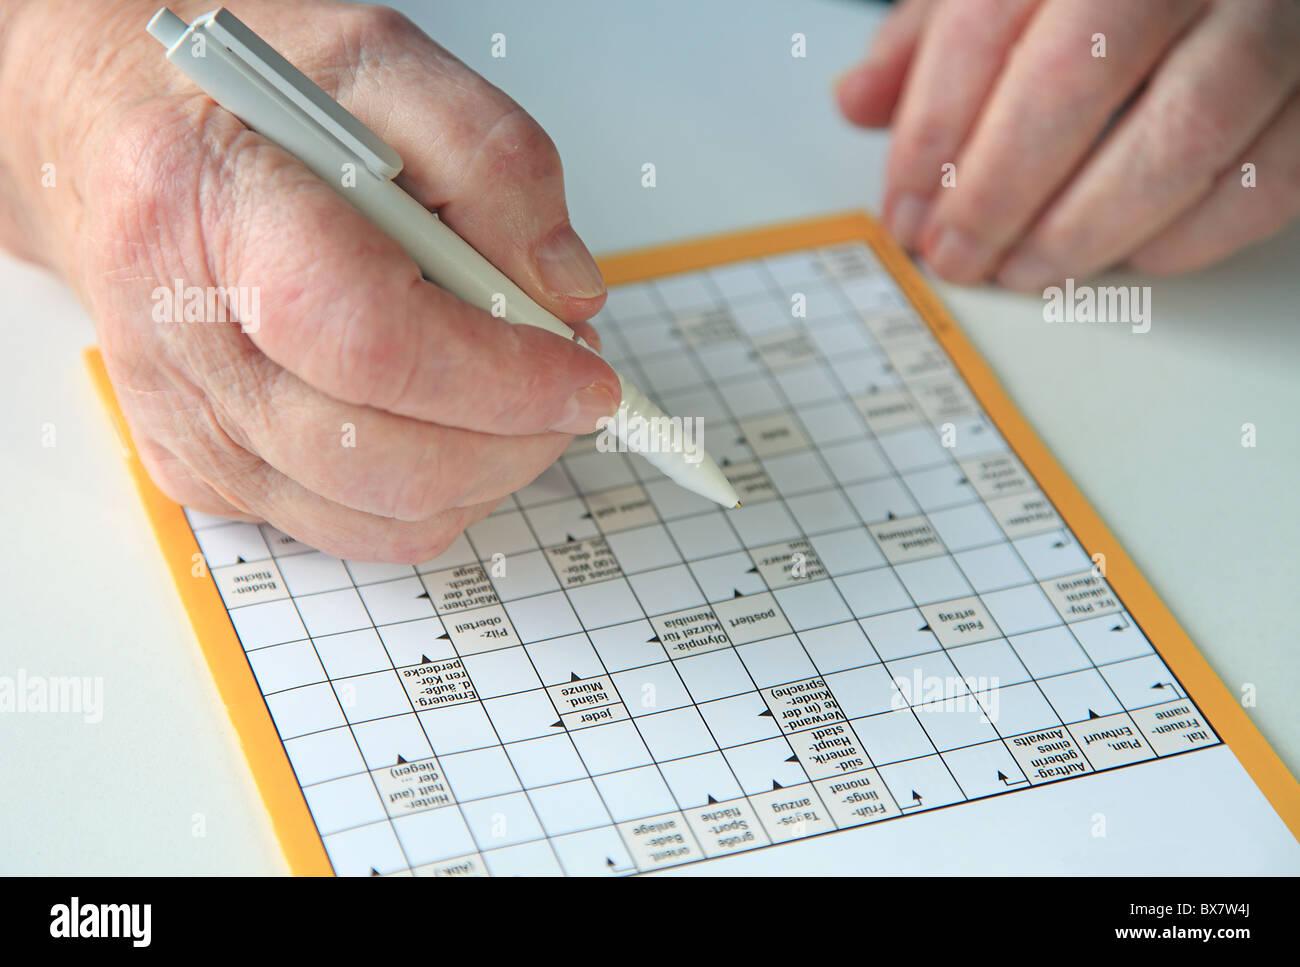 Crossword Puzzle Stock Photos & Crossword Puzzle Stock Images - Alamy